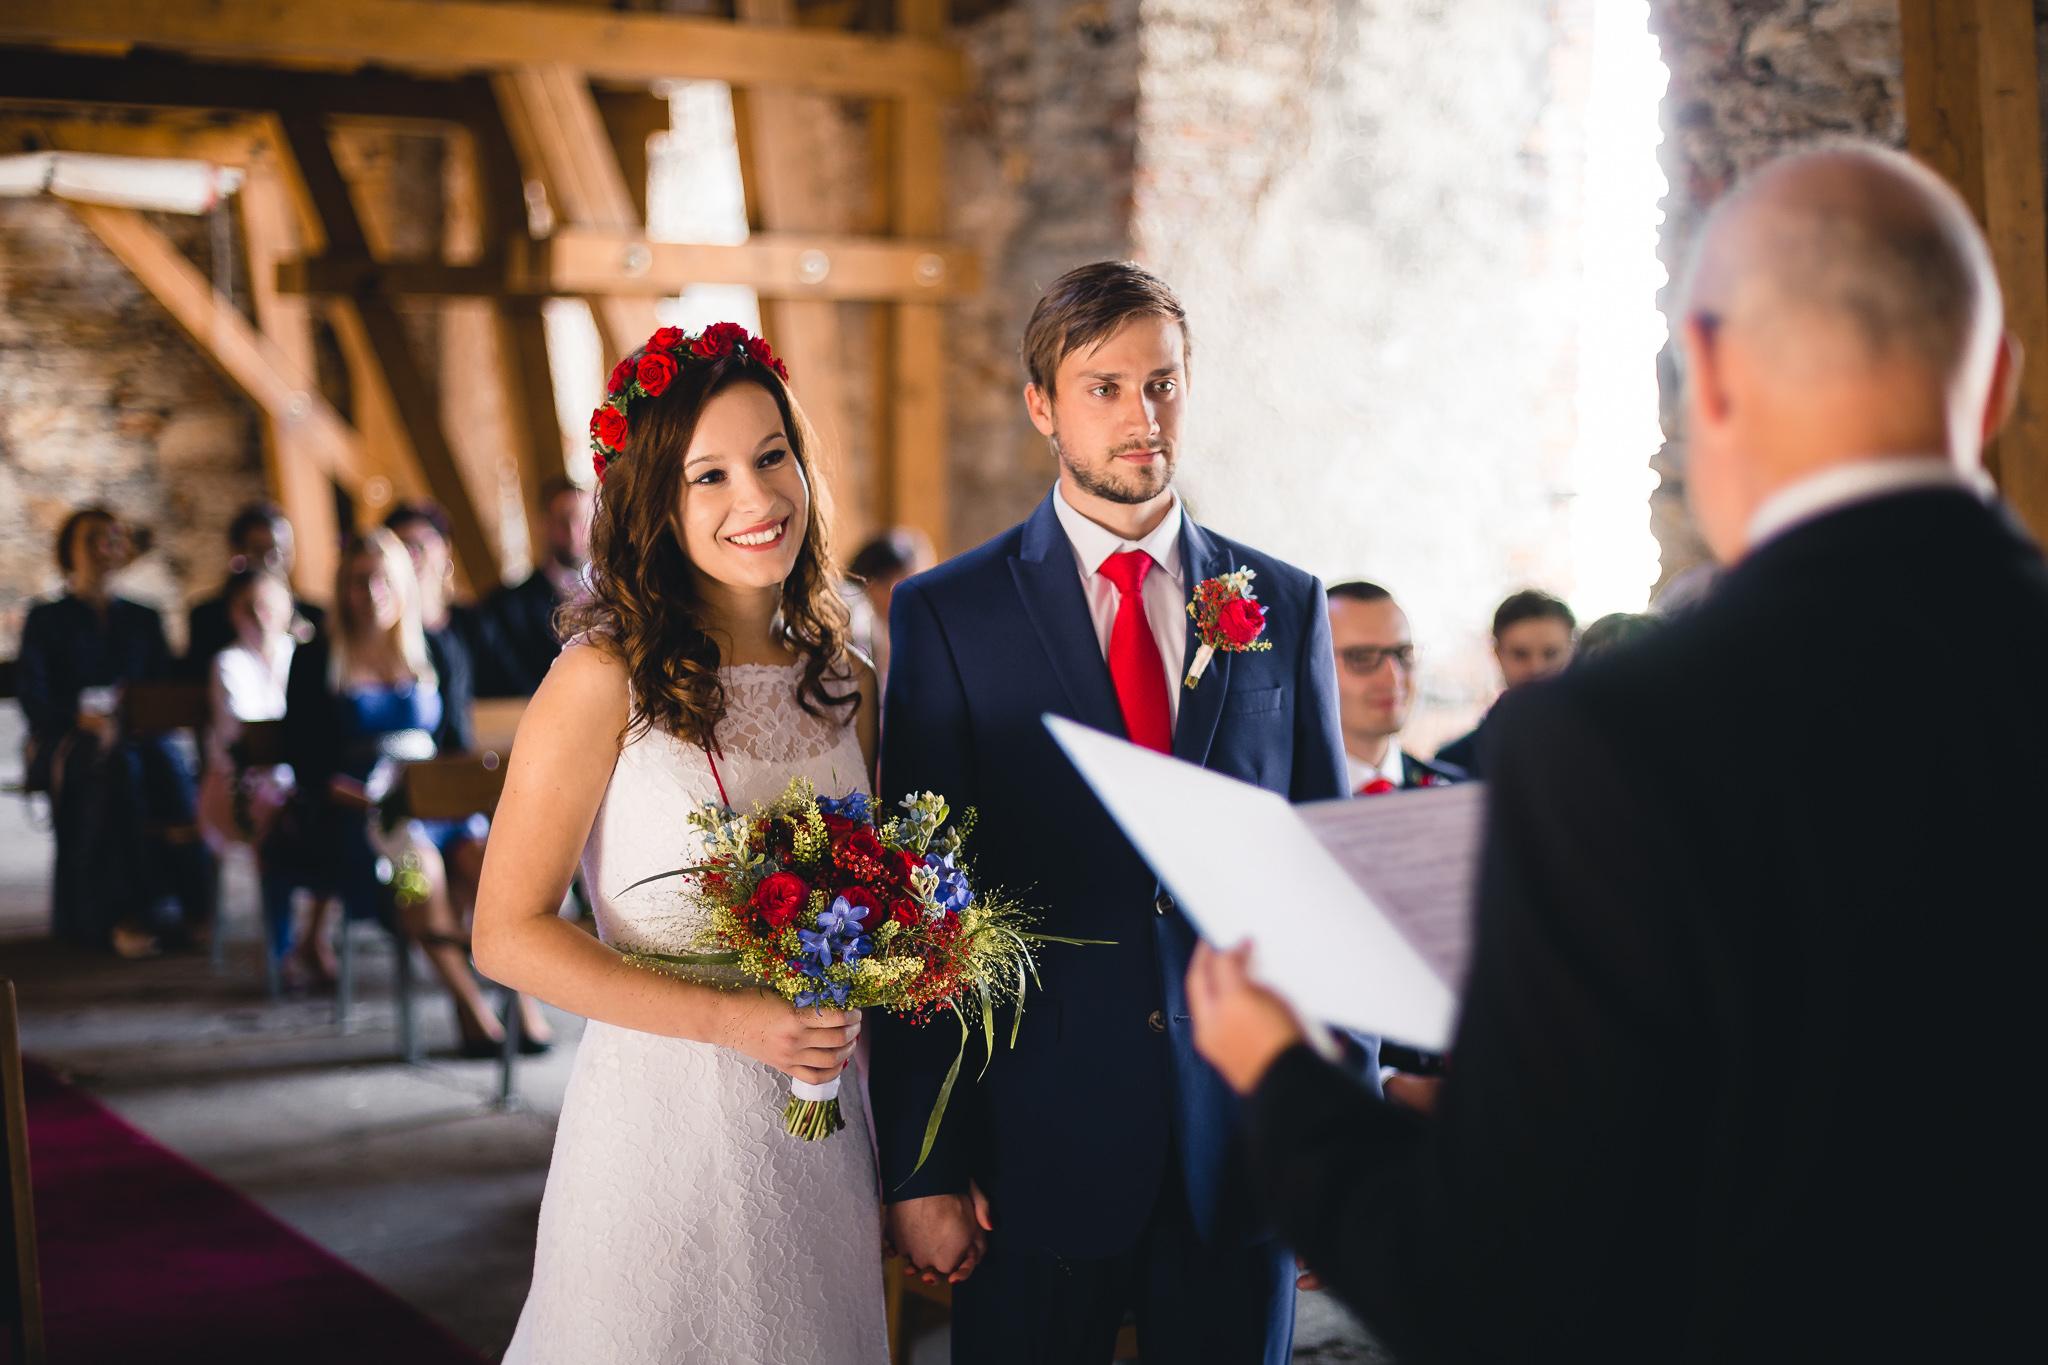 Svatba Báry a Lukáše na hradě Košumberk